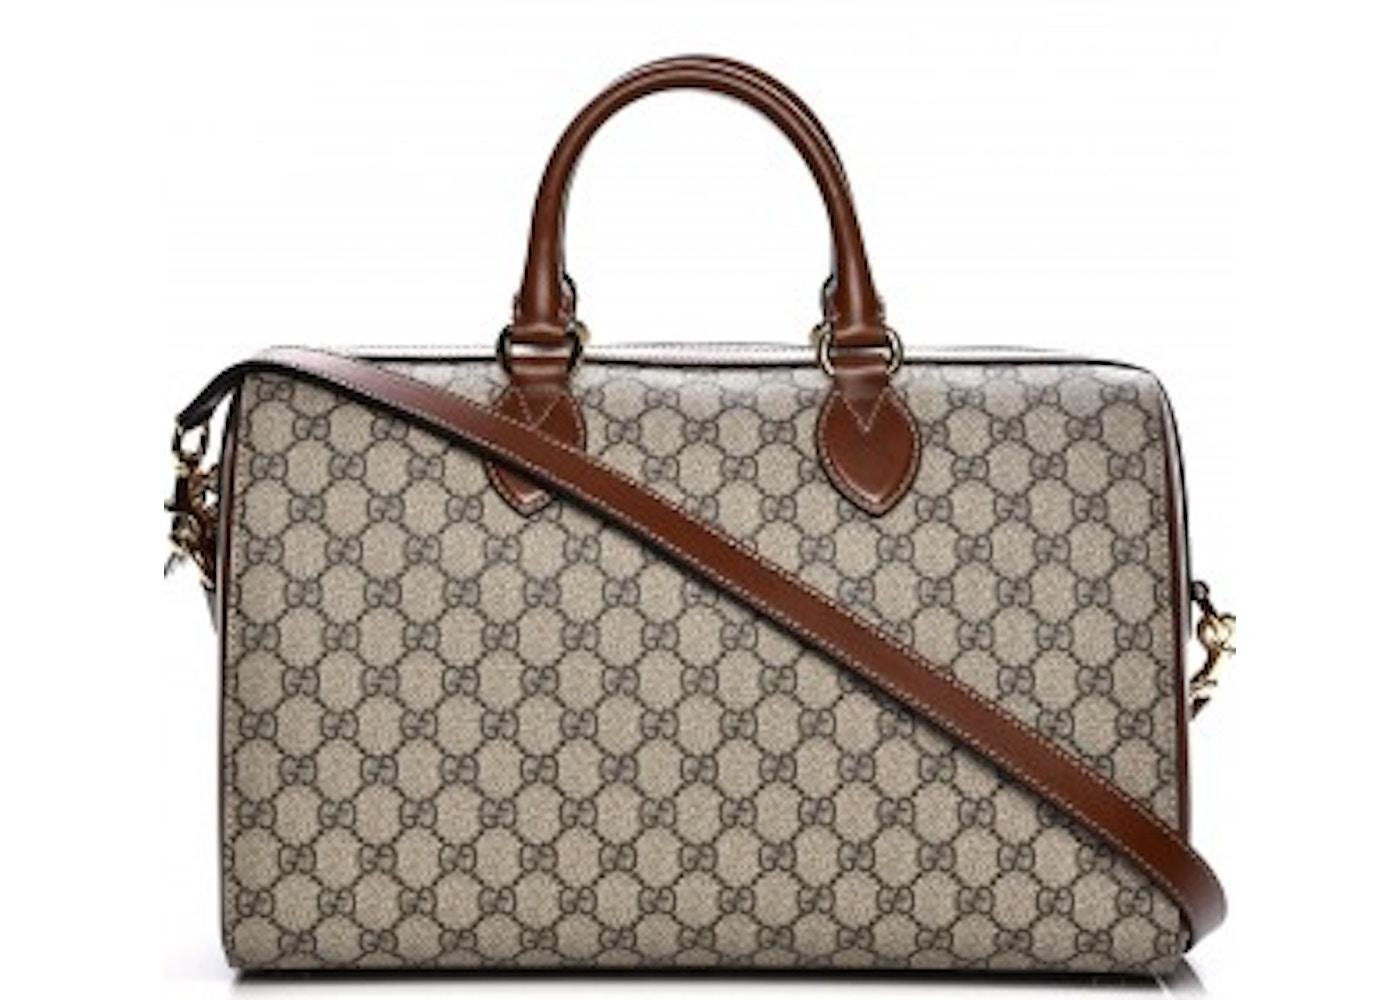 a5562541c0d Gucci Boston Bag Top Handle GG Supreme Monogram Medium Brown Beige. GG  Supreme Monogram Medium Brown Beige